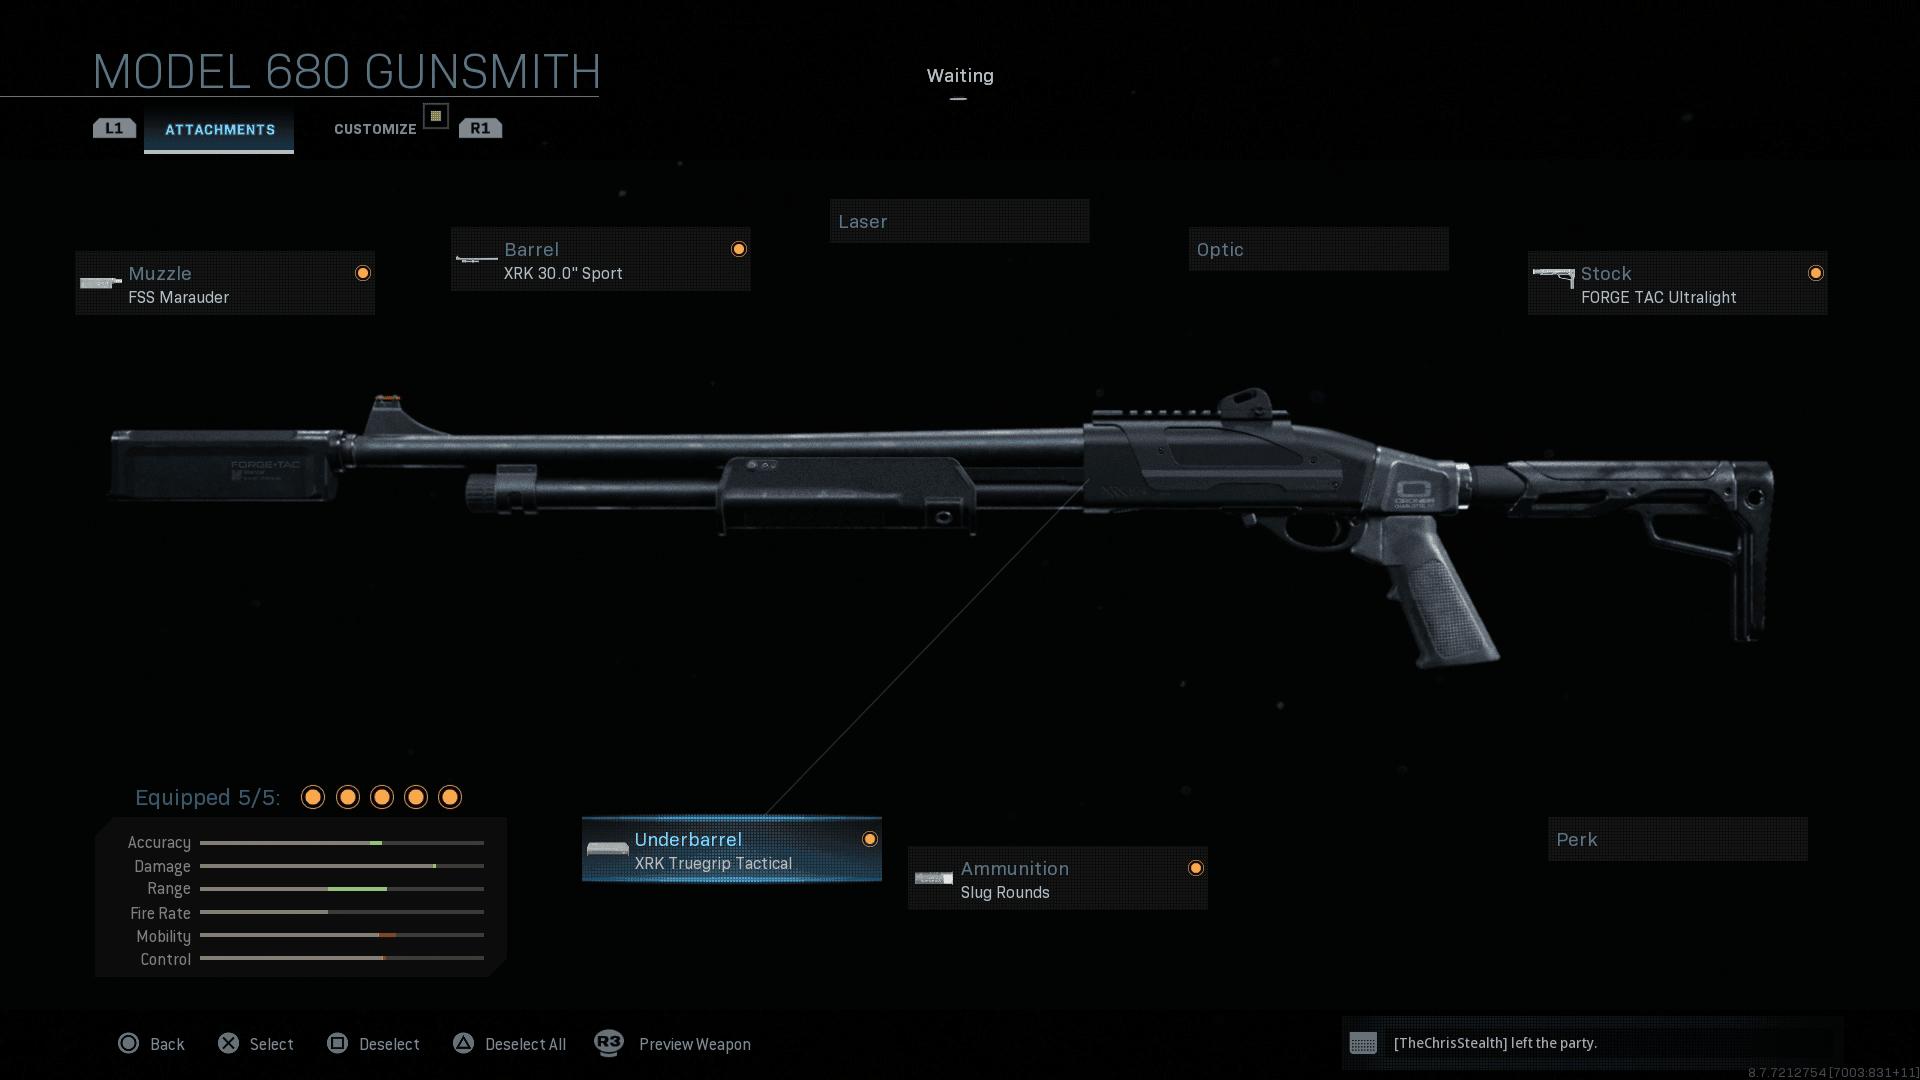 Glitch Modern warfare Infinity Ward tir infini Model 680